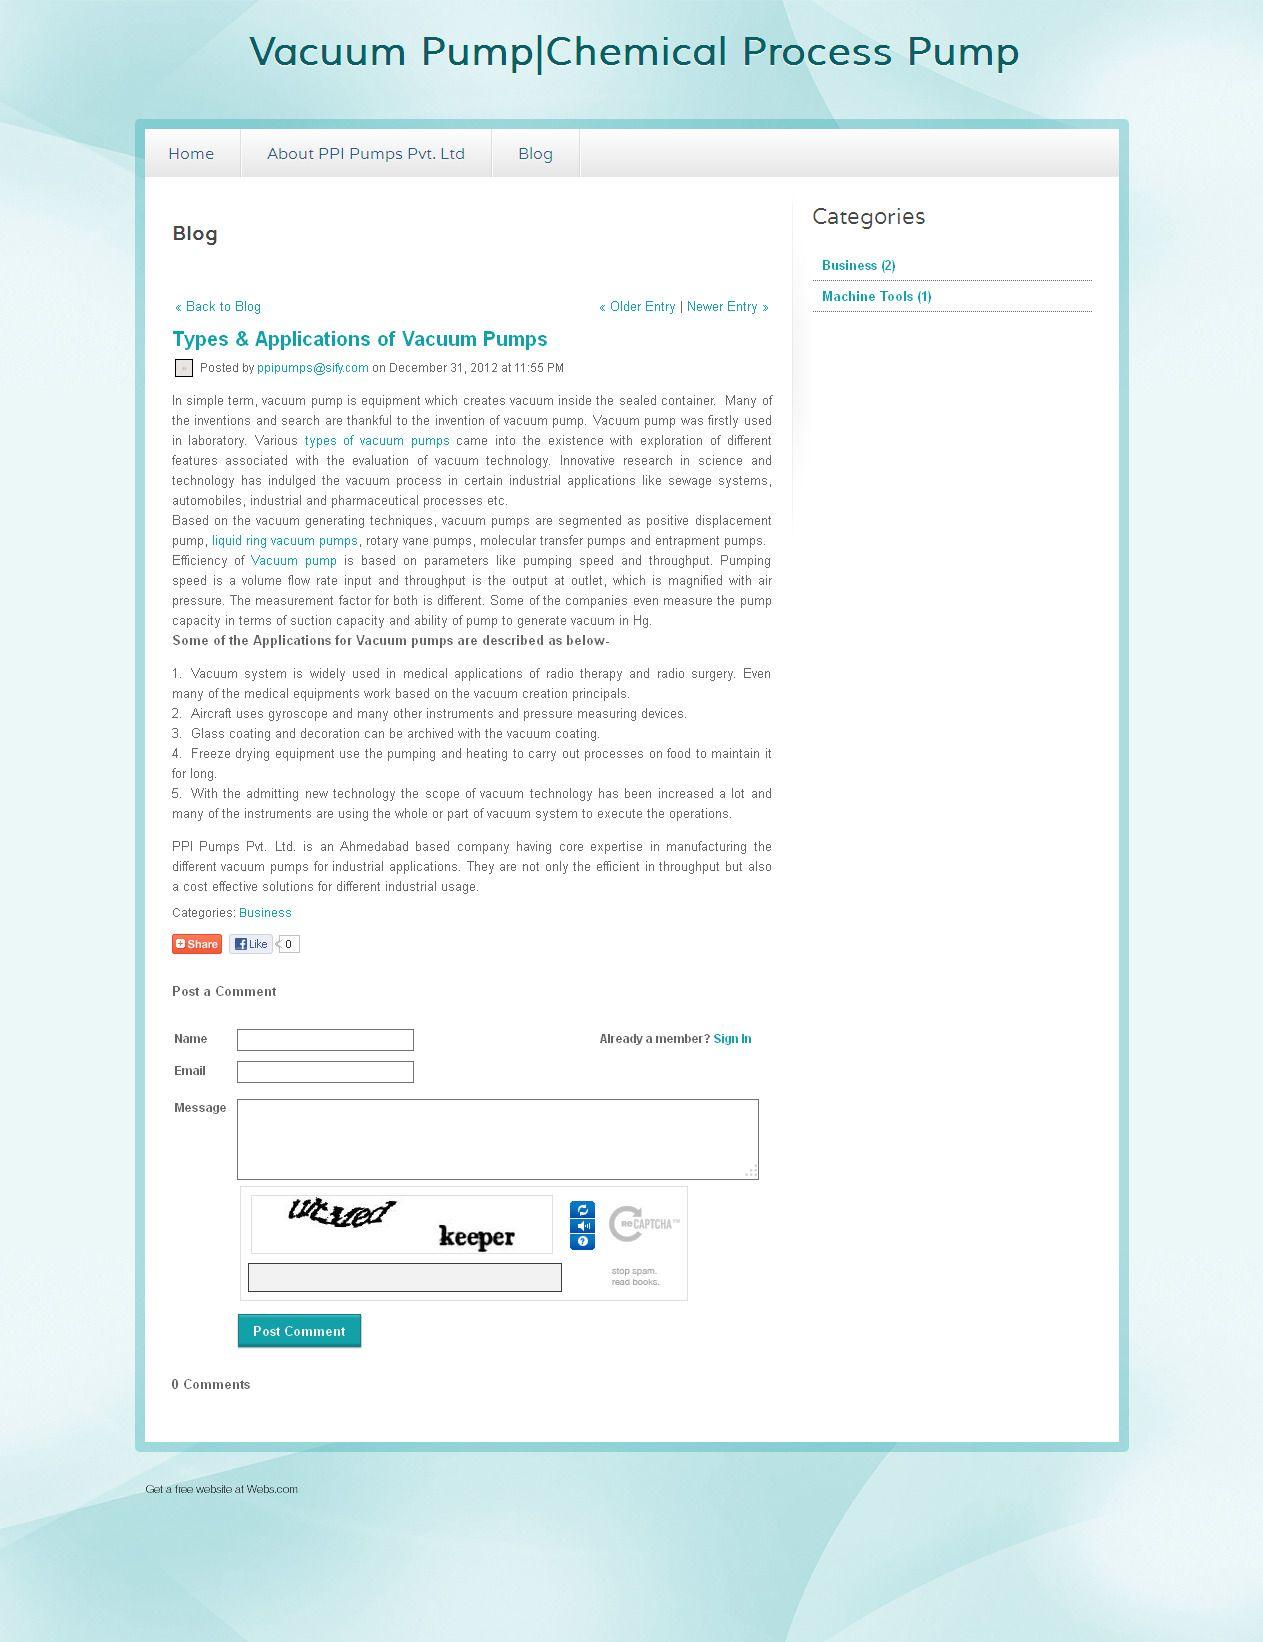 The Blog Explains The Detailed Information Regarding The Vacuum